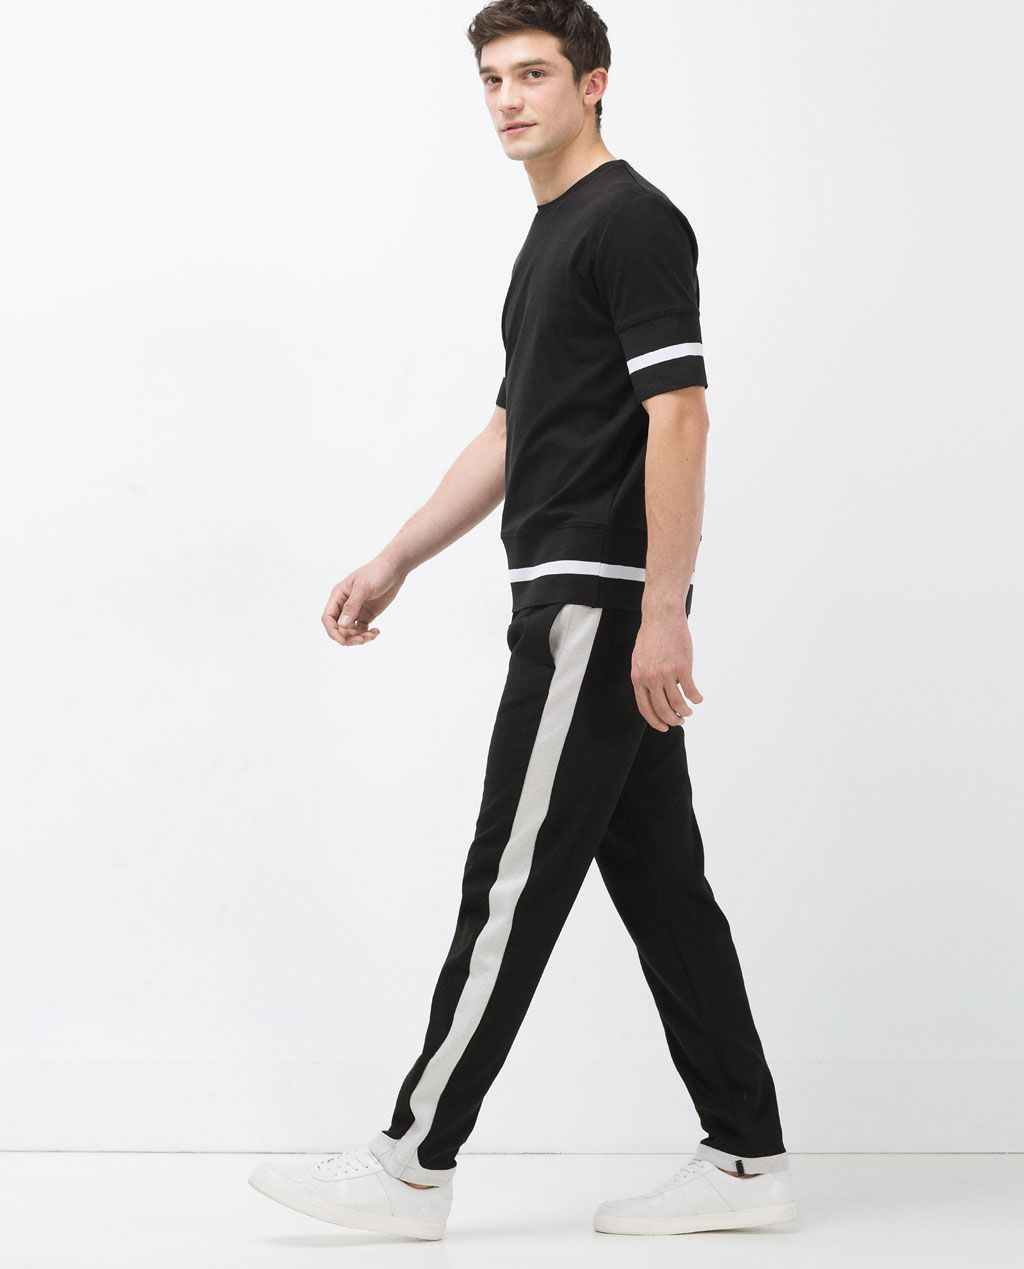 imagen 1 de pantal n jogging de zara jogger pinterest. Black Bedroom Furniture Sets. Home Design Ideas